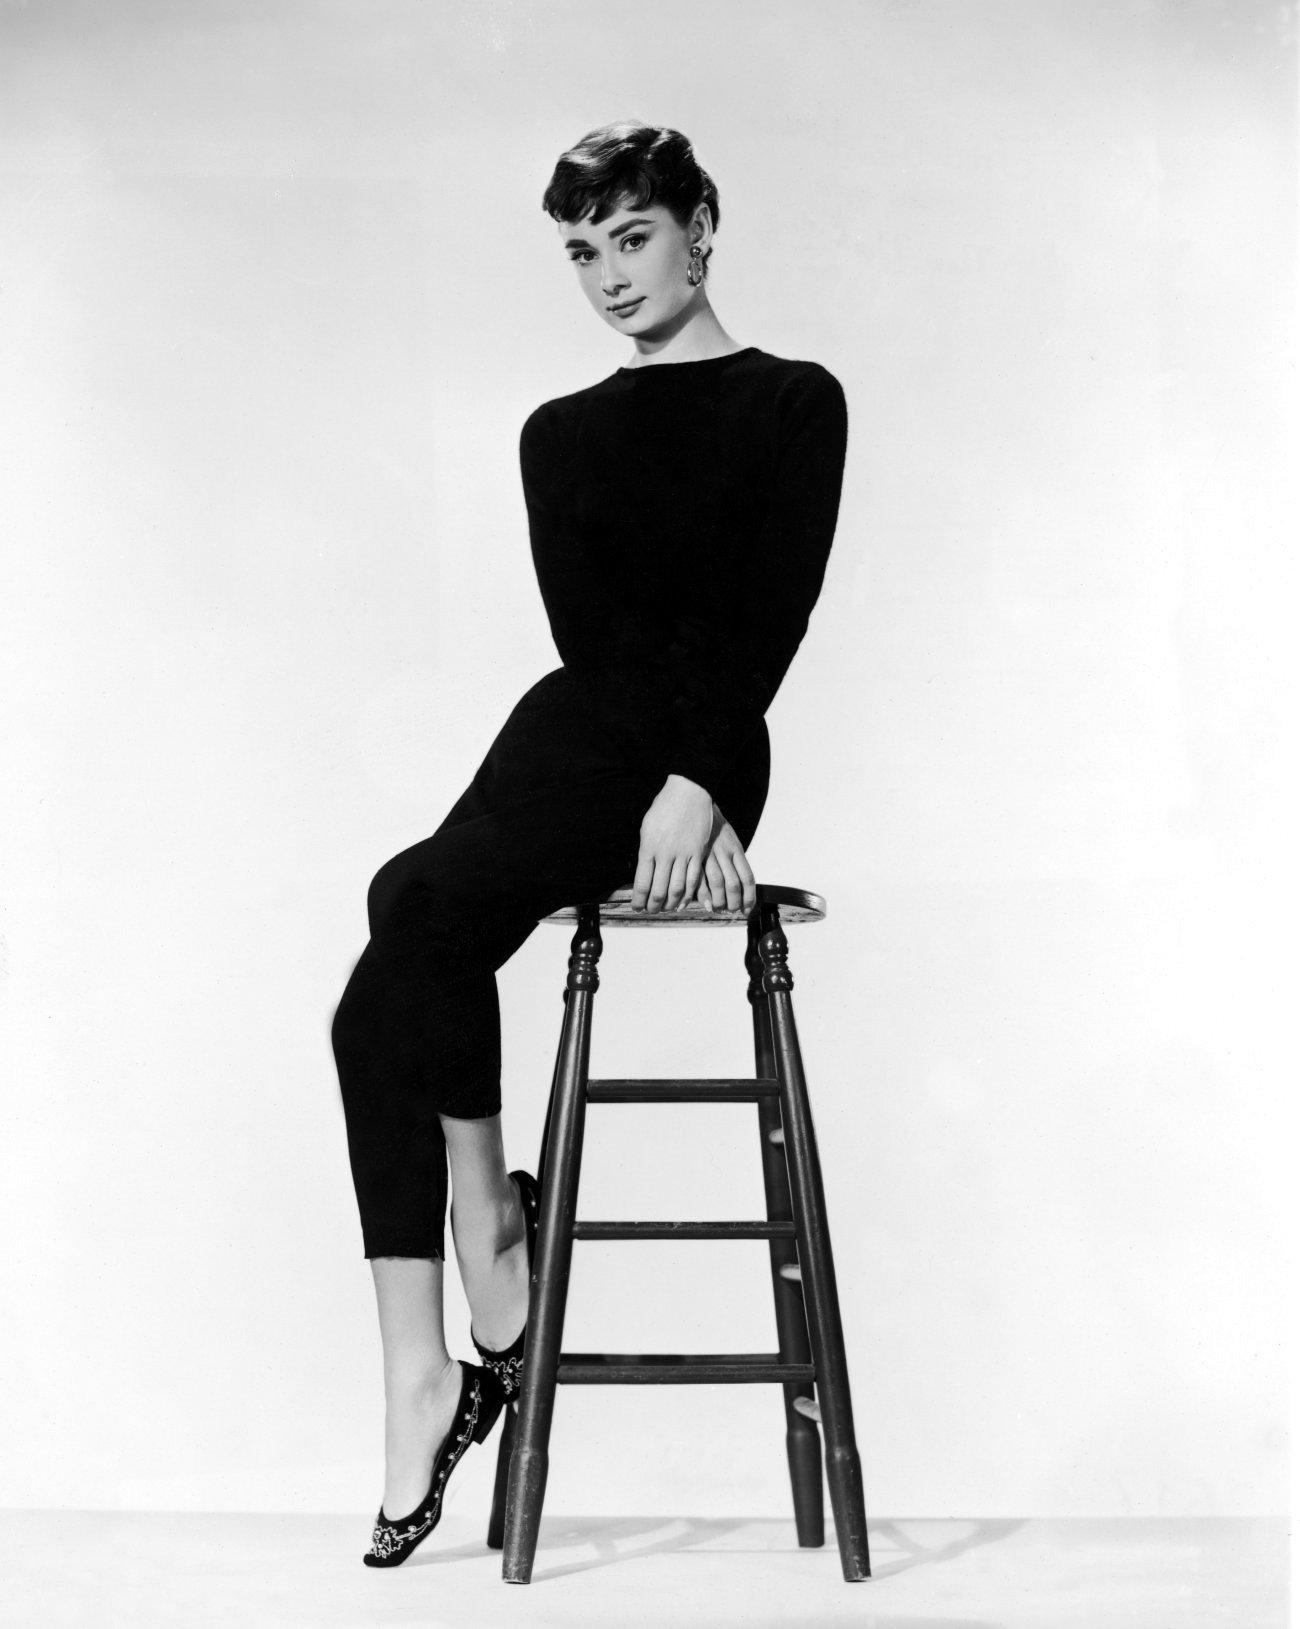 Pixie Cut Audrey Hepburn Sabrina-audrey-hepburn-